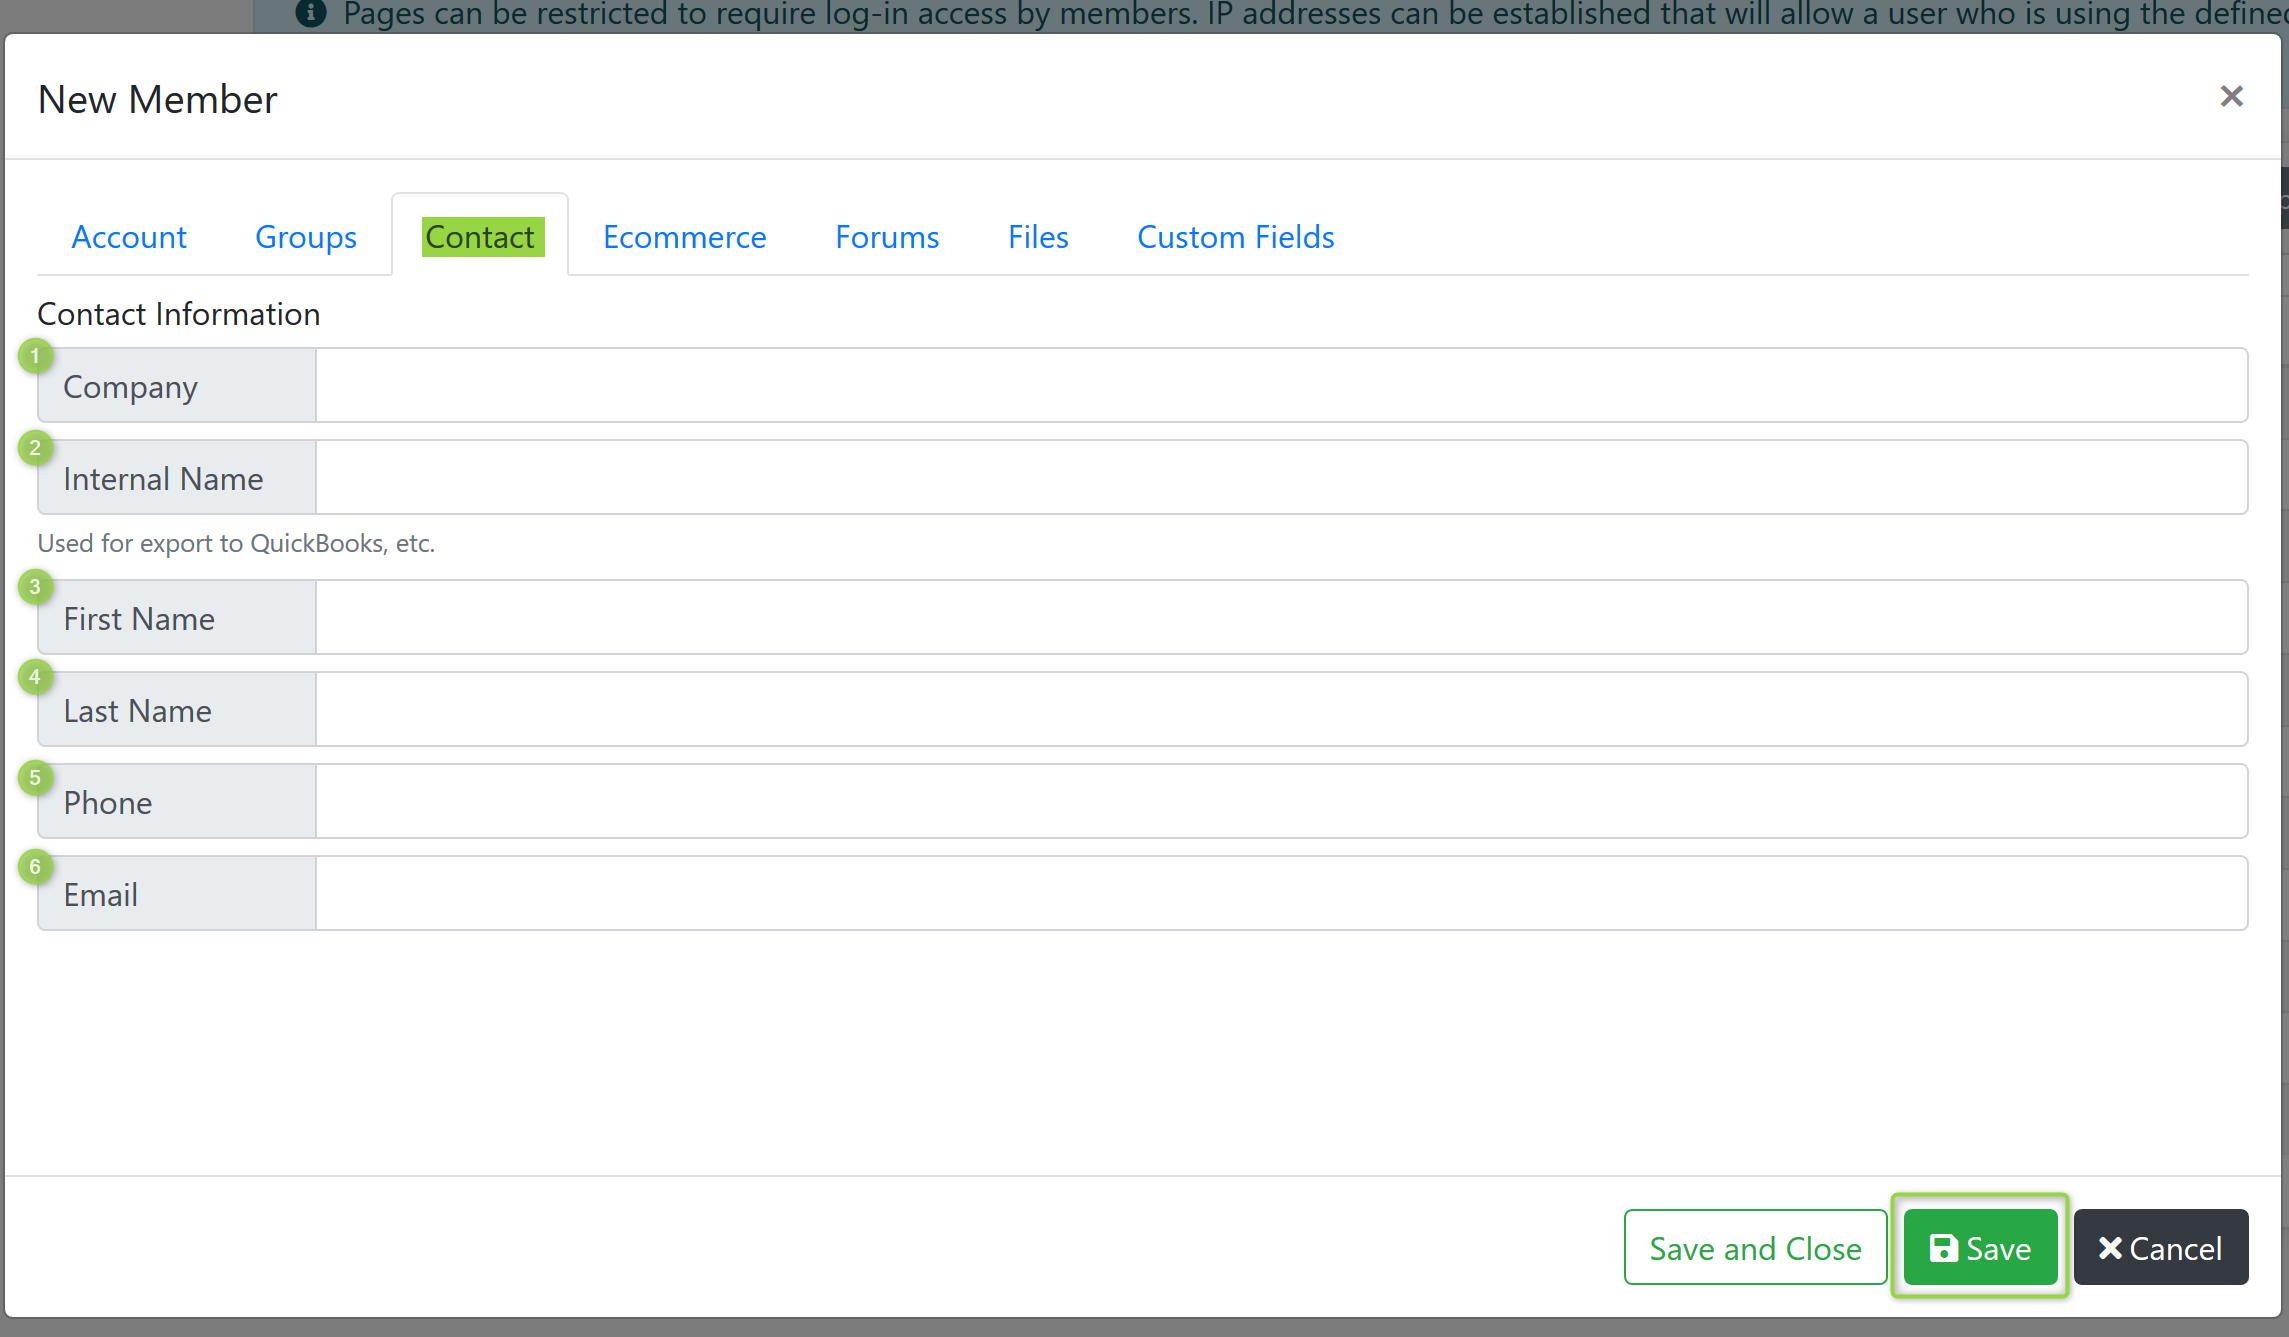 New Member Contact Screenshot